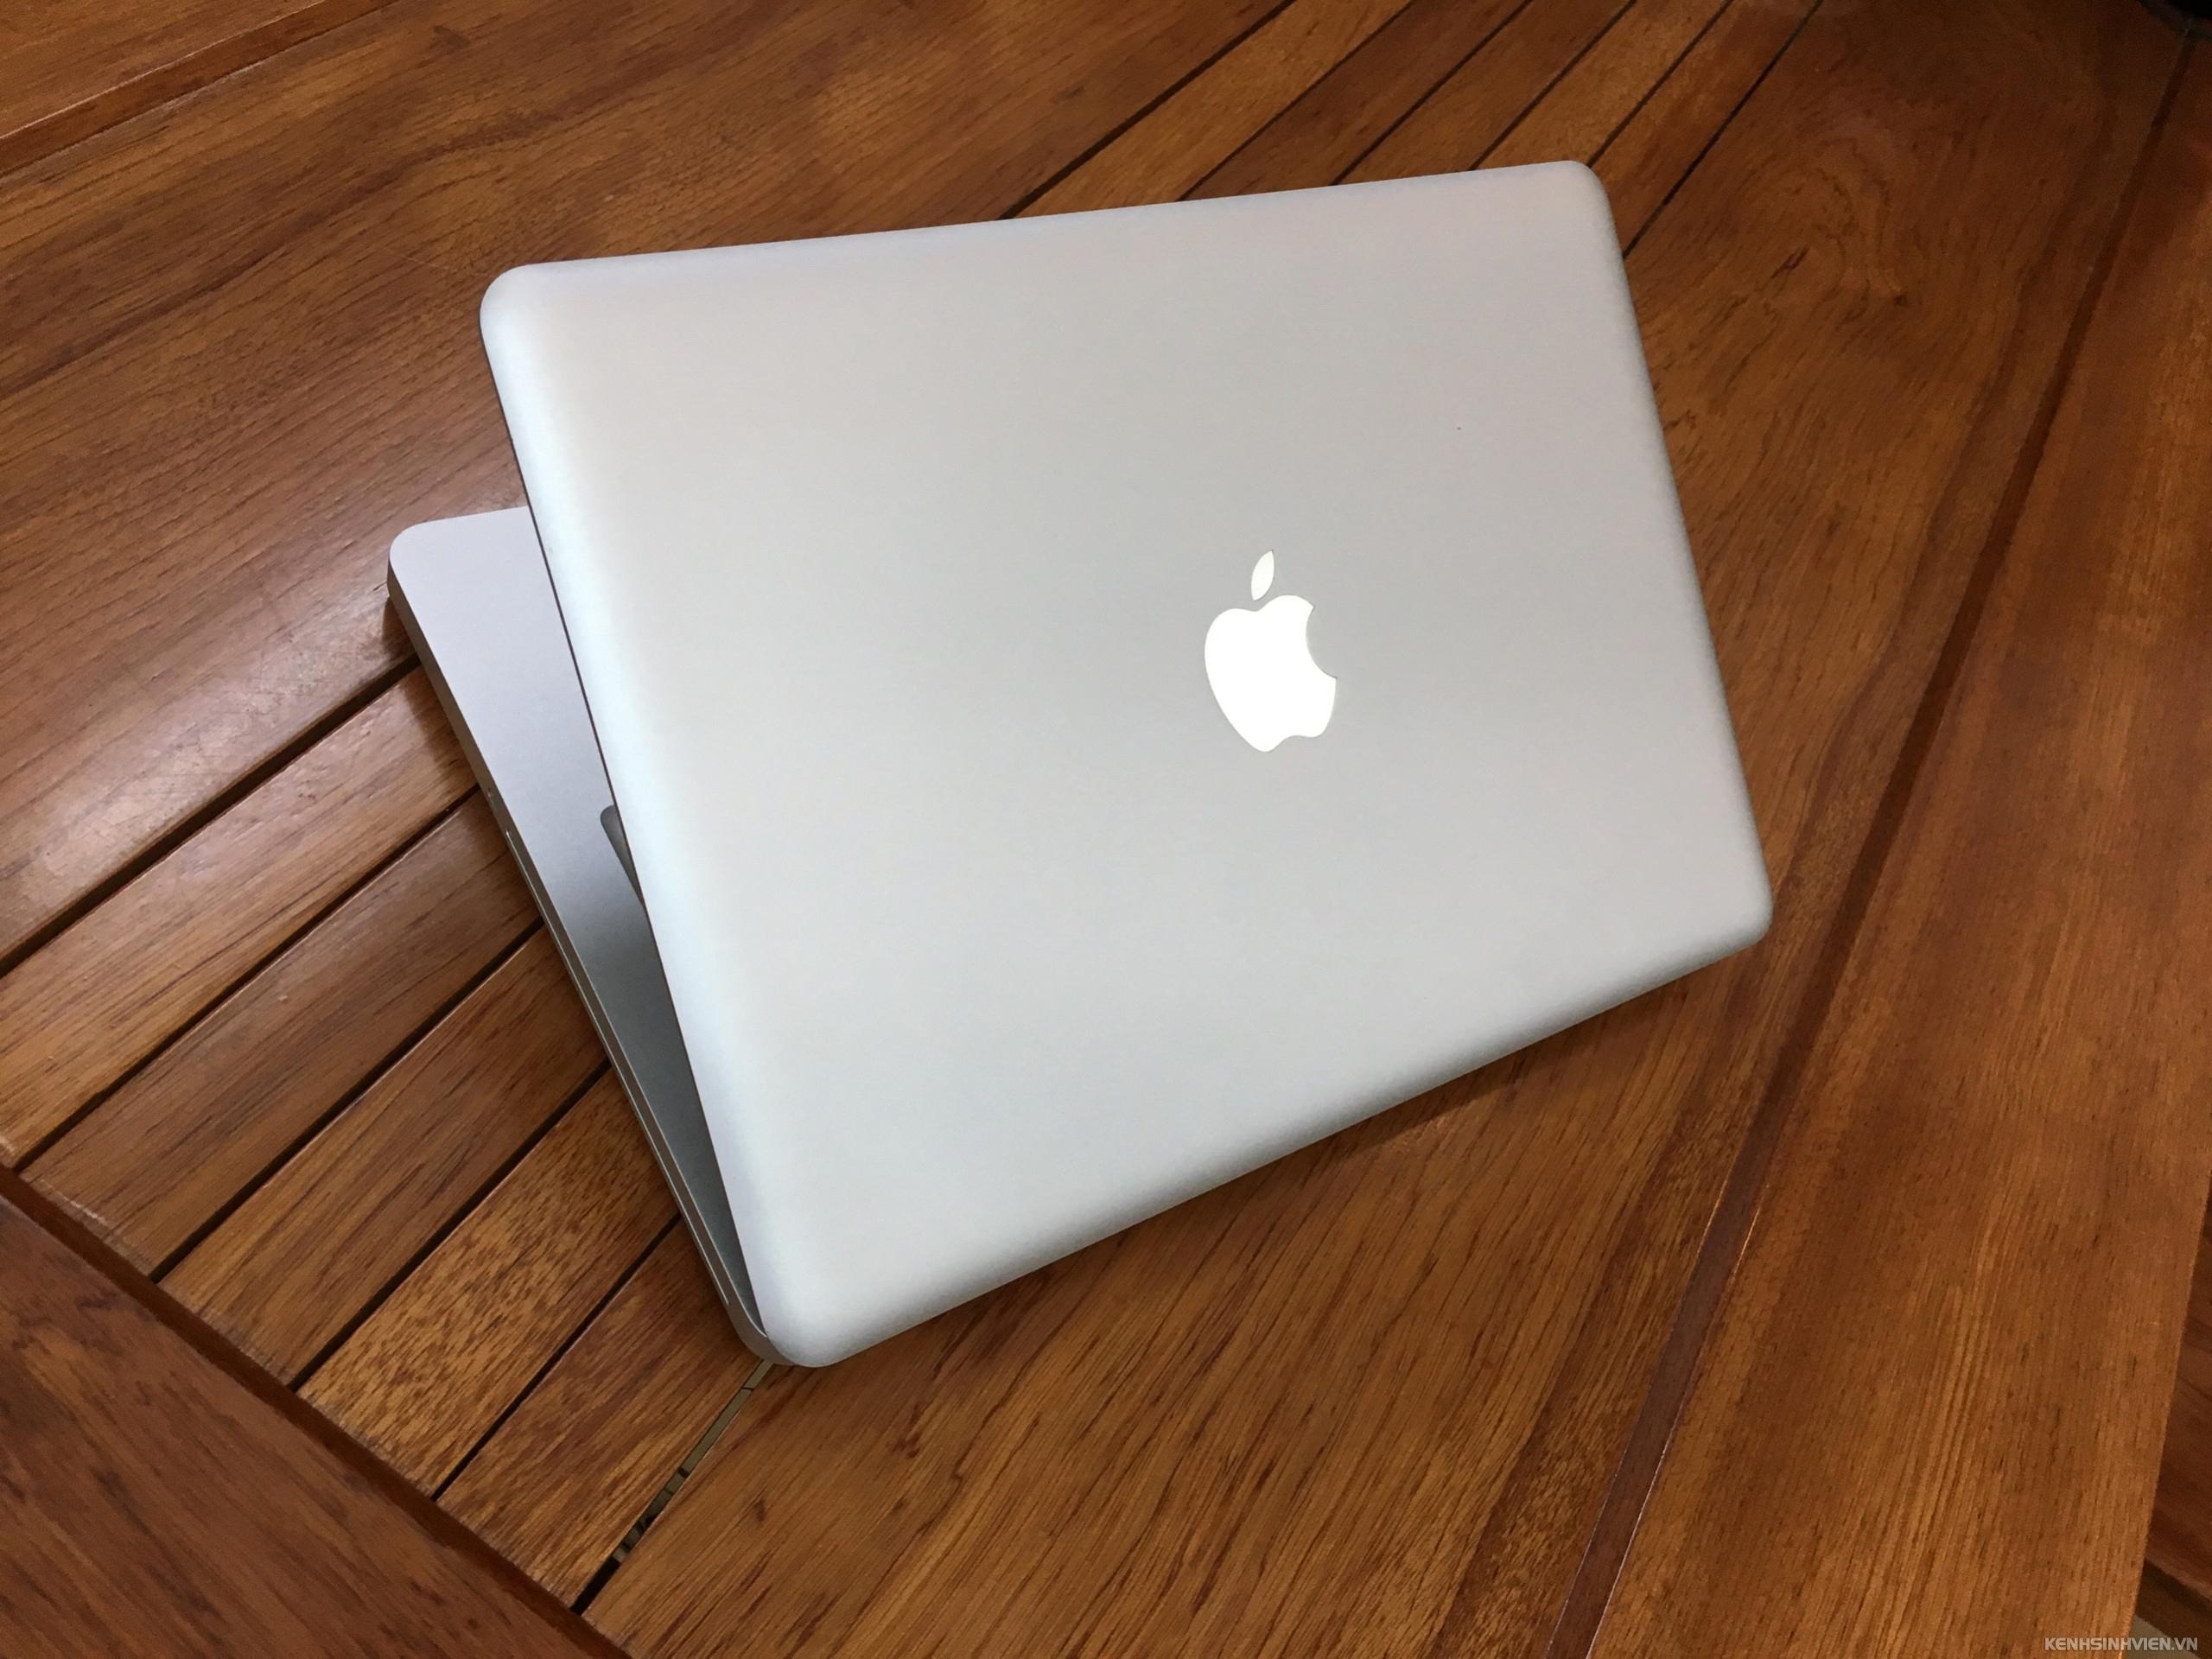 macbook-pro-late-2011-8.jpg